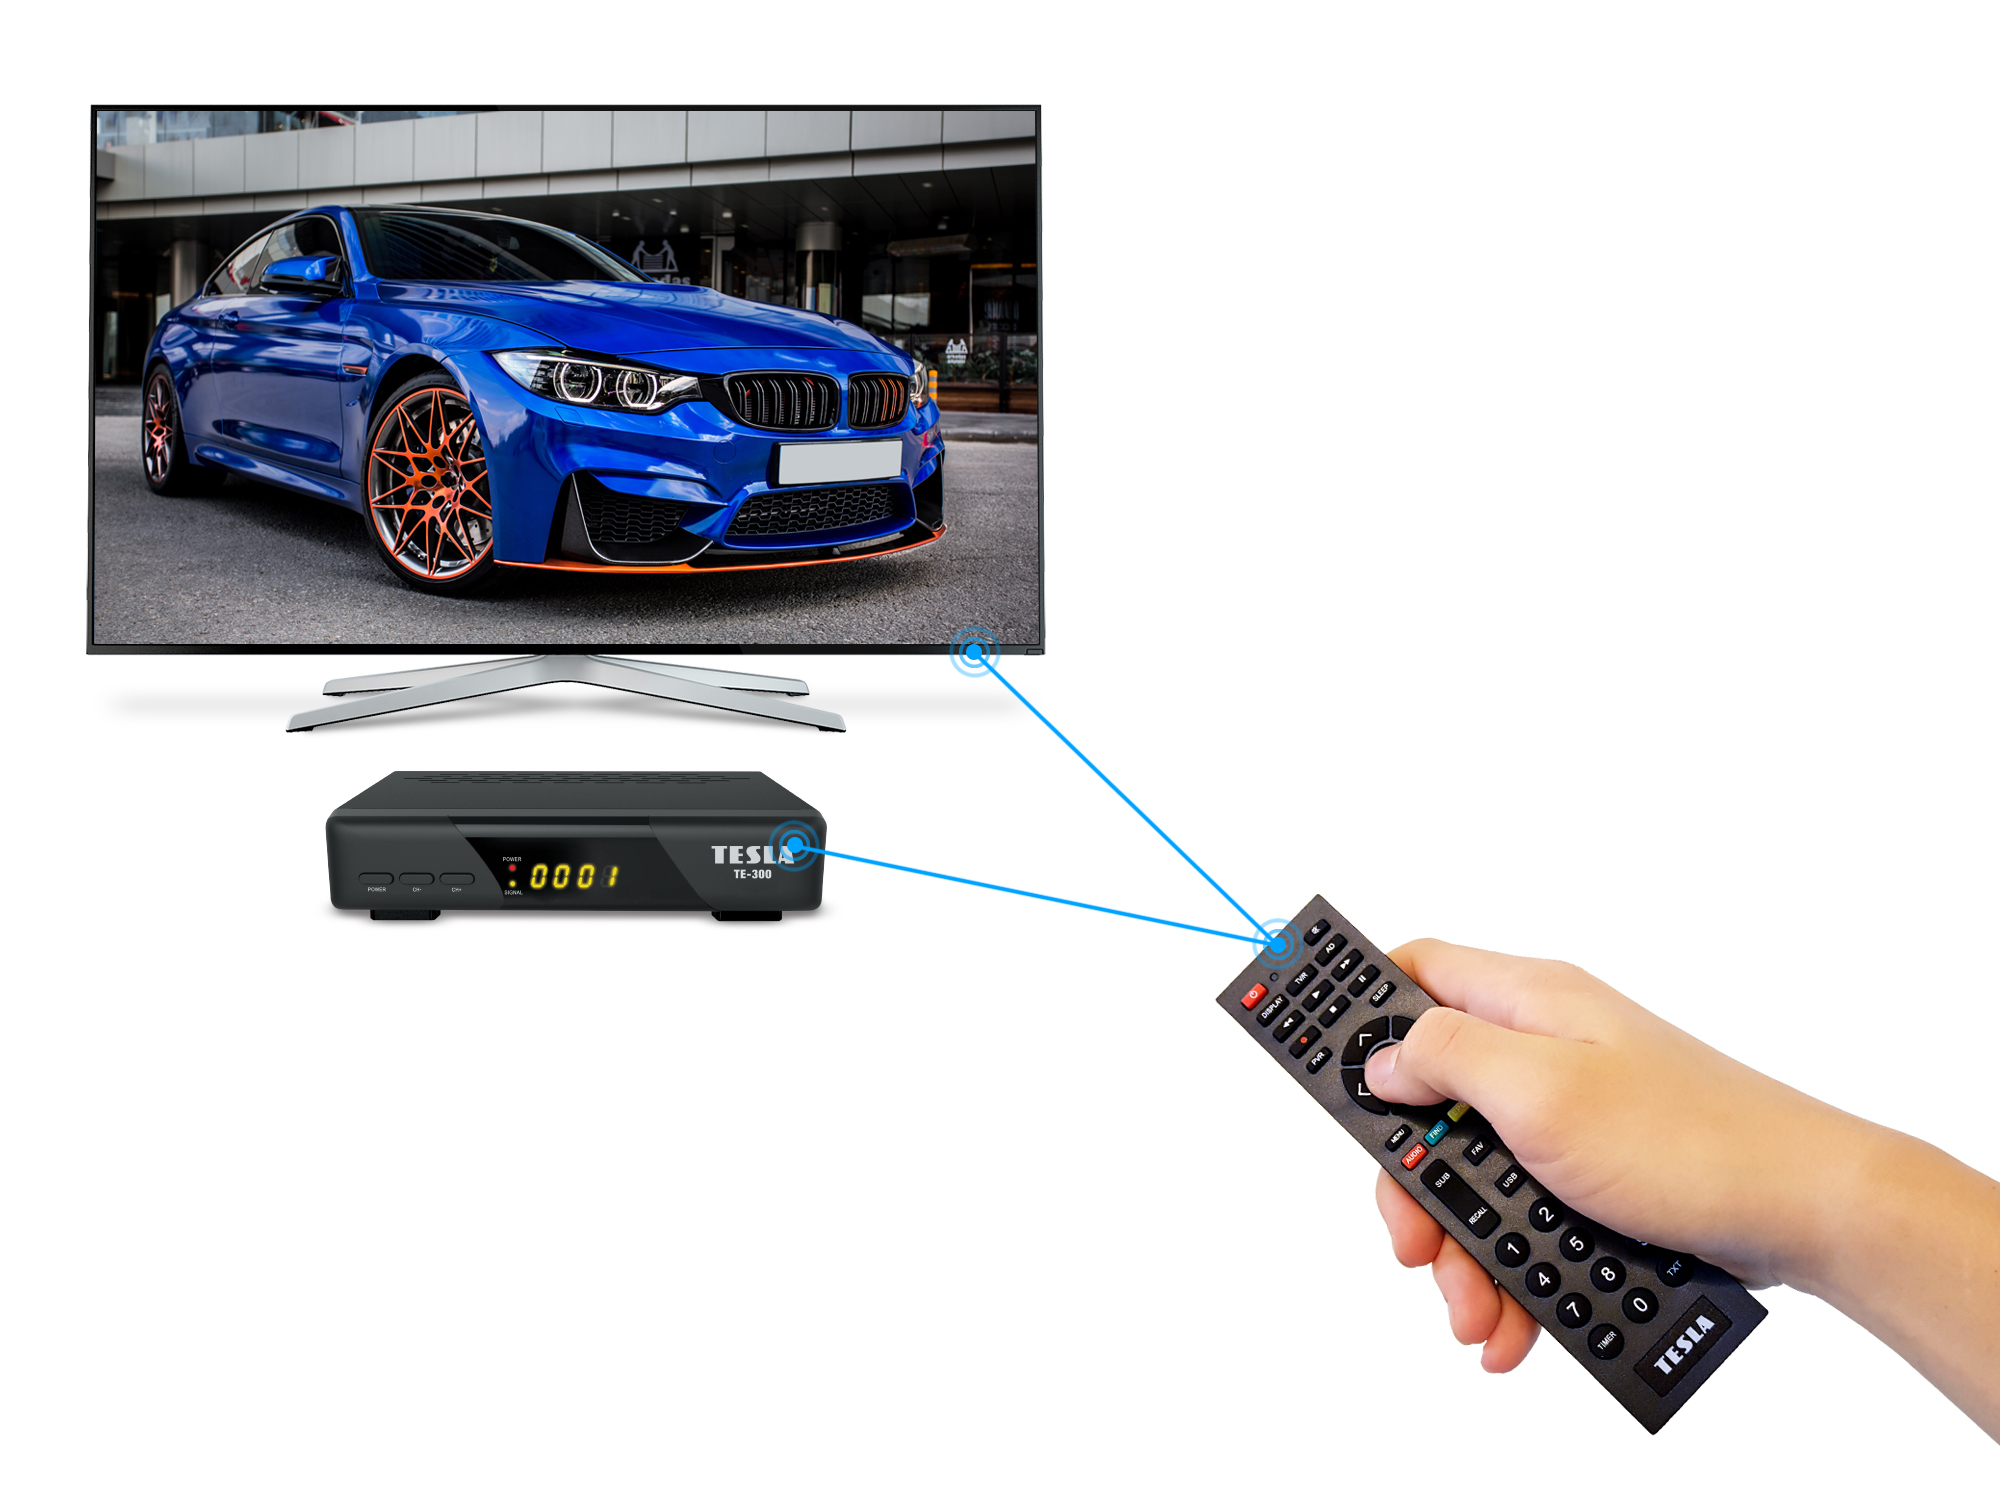 HDMI_CEC_vizualizace_TE-300